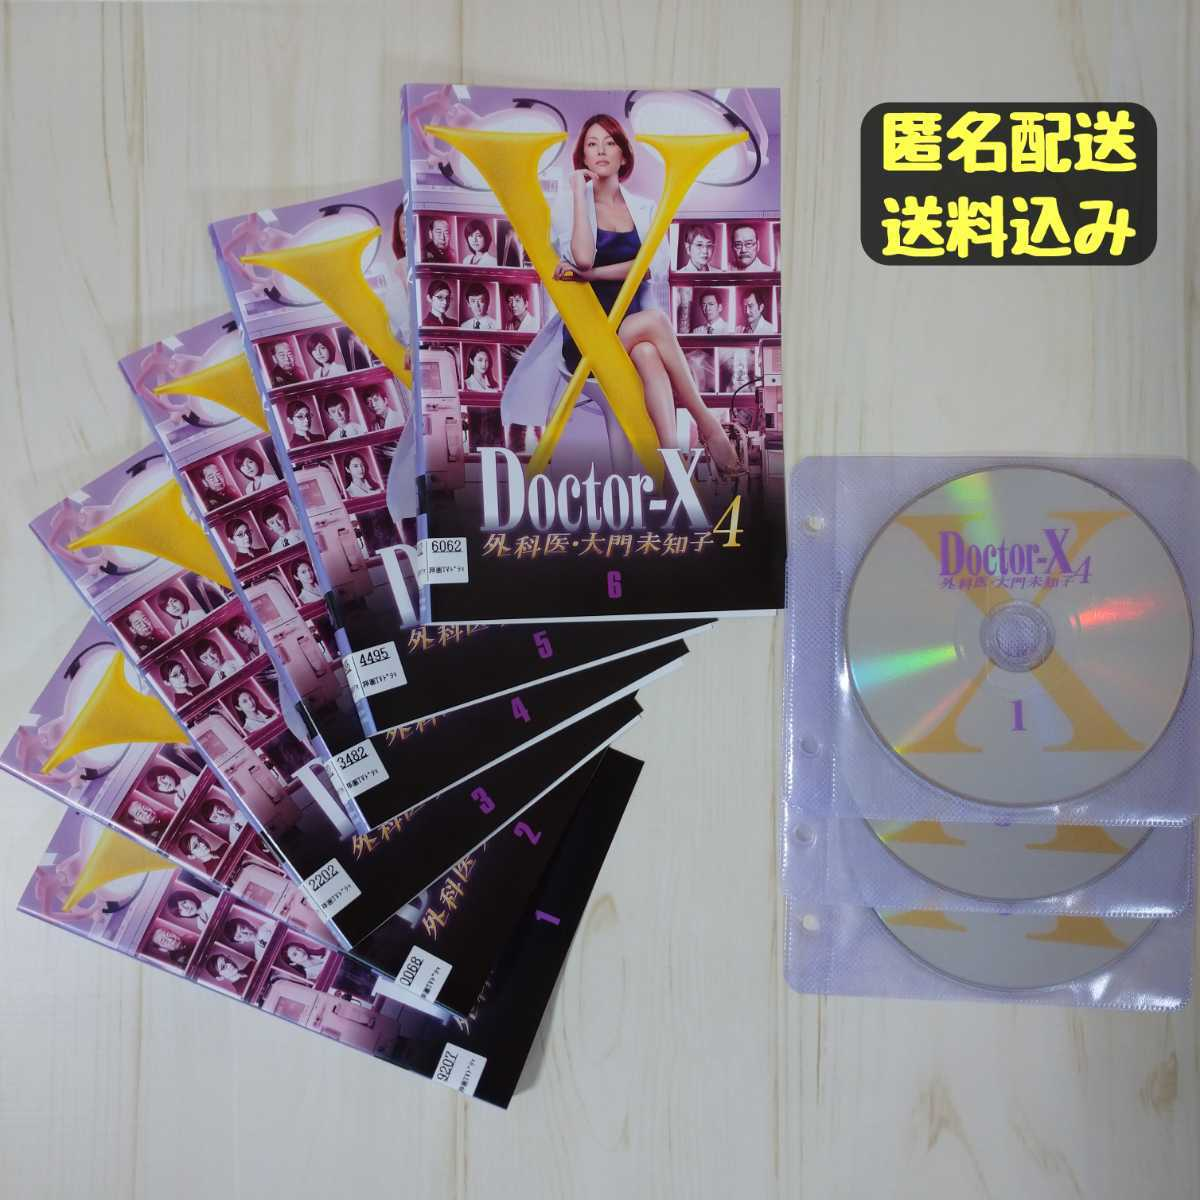 【DVD】Doctor-X ドクターX シーズン4 全巻 完結 6枚セット レンタル落ち 米倉涼子